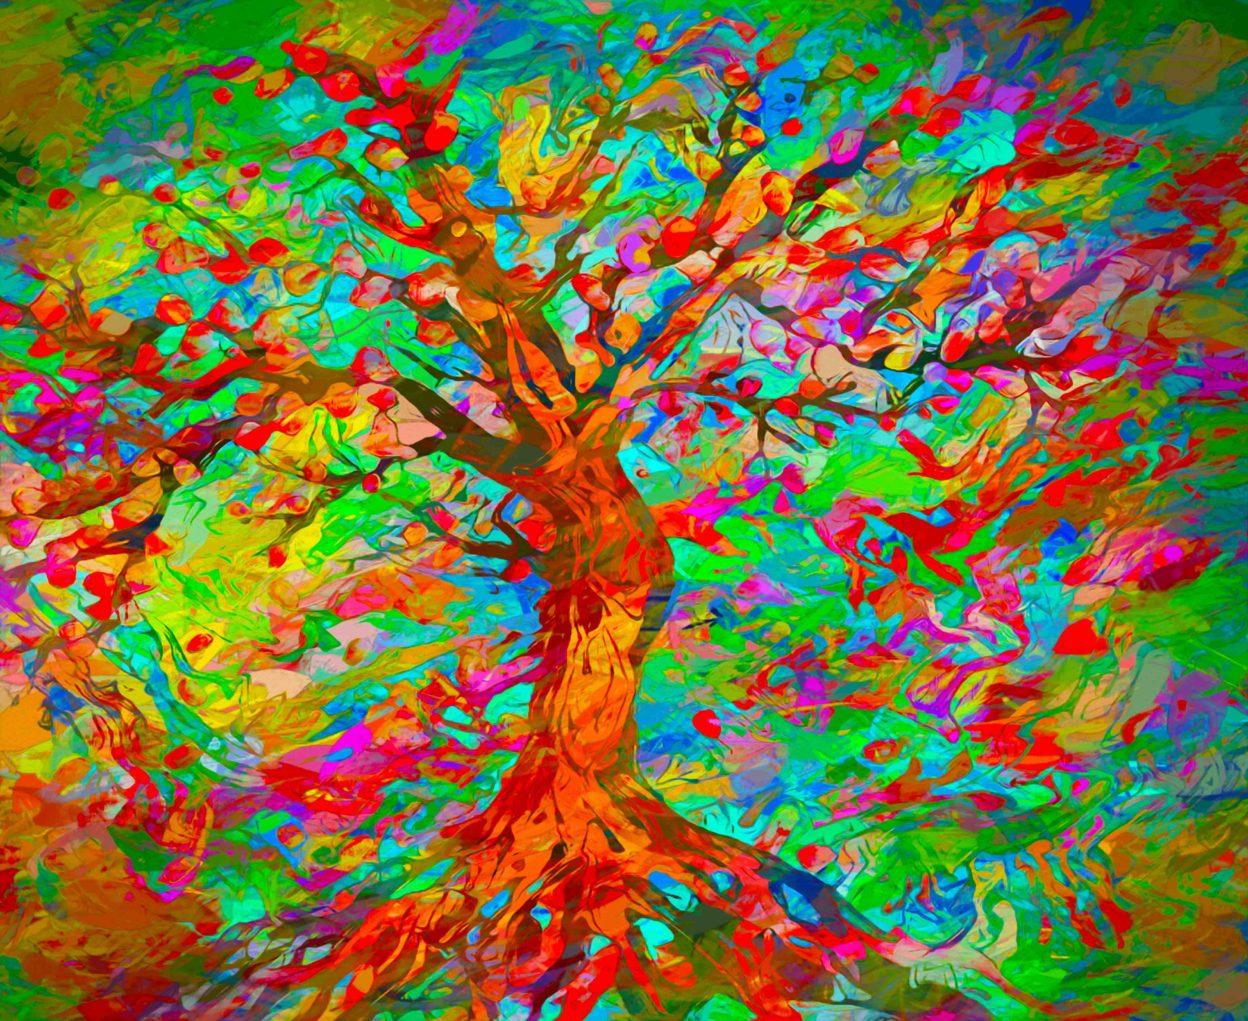 Fall Sunshine Wallpaper Bright Colorful Art Www Pixshark Com Images Galleries